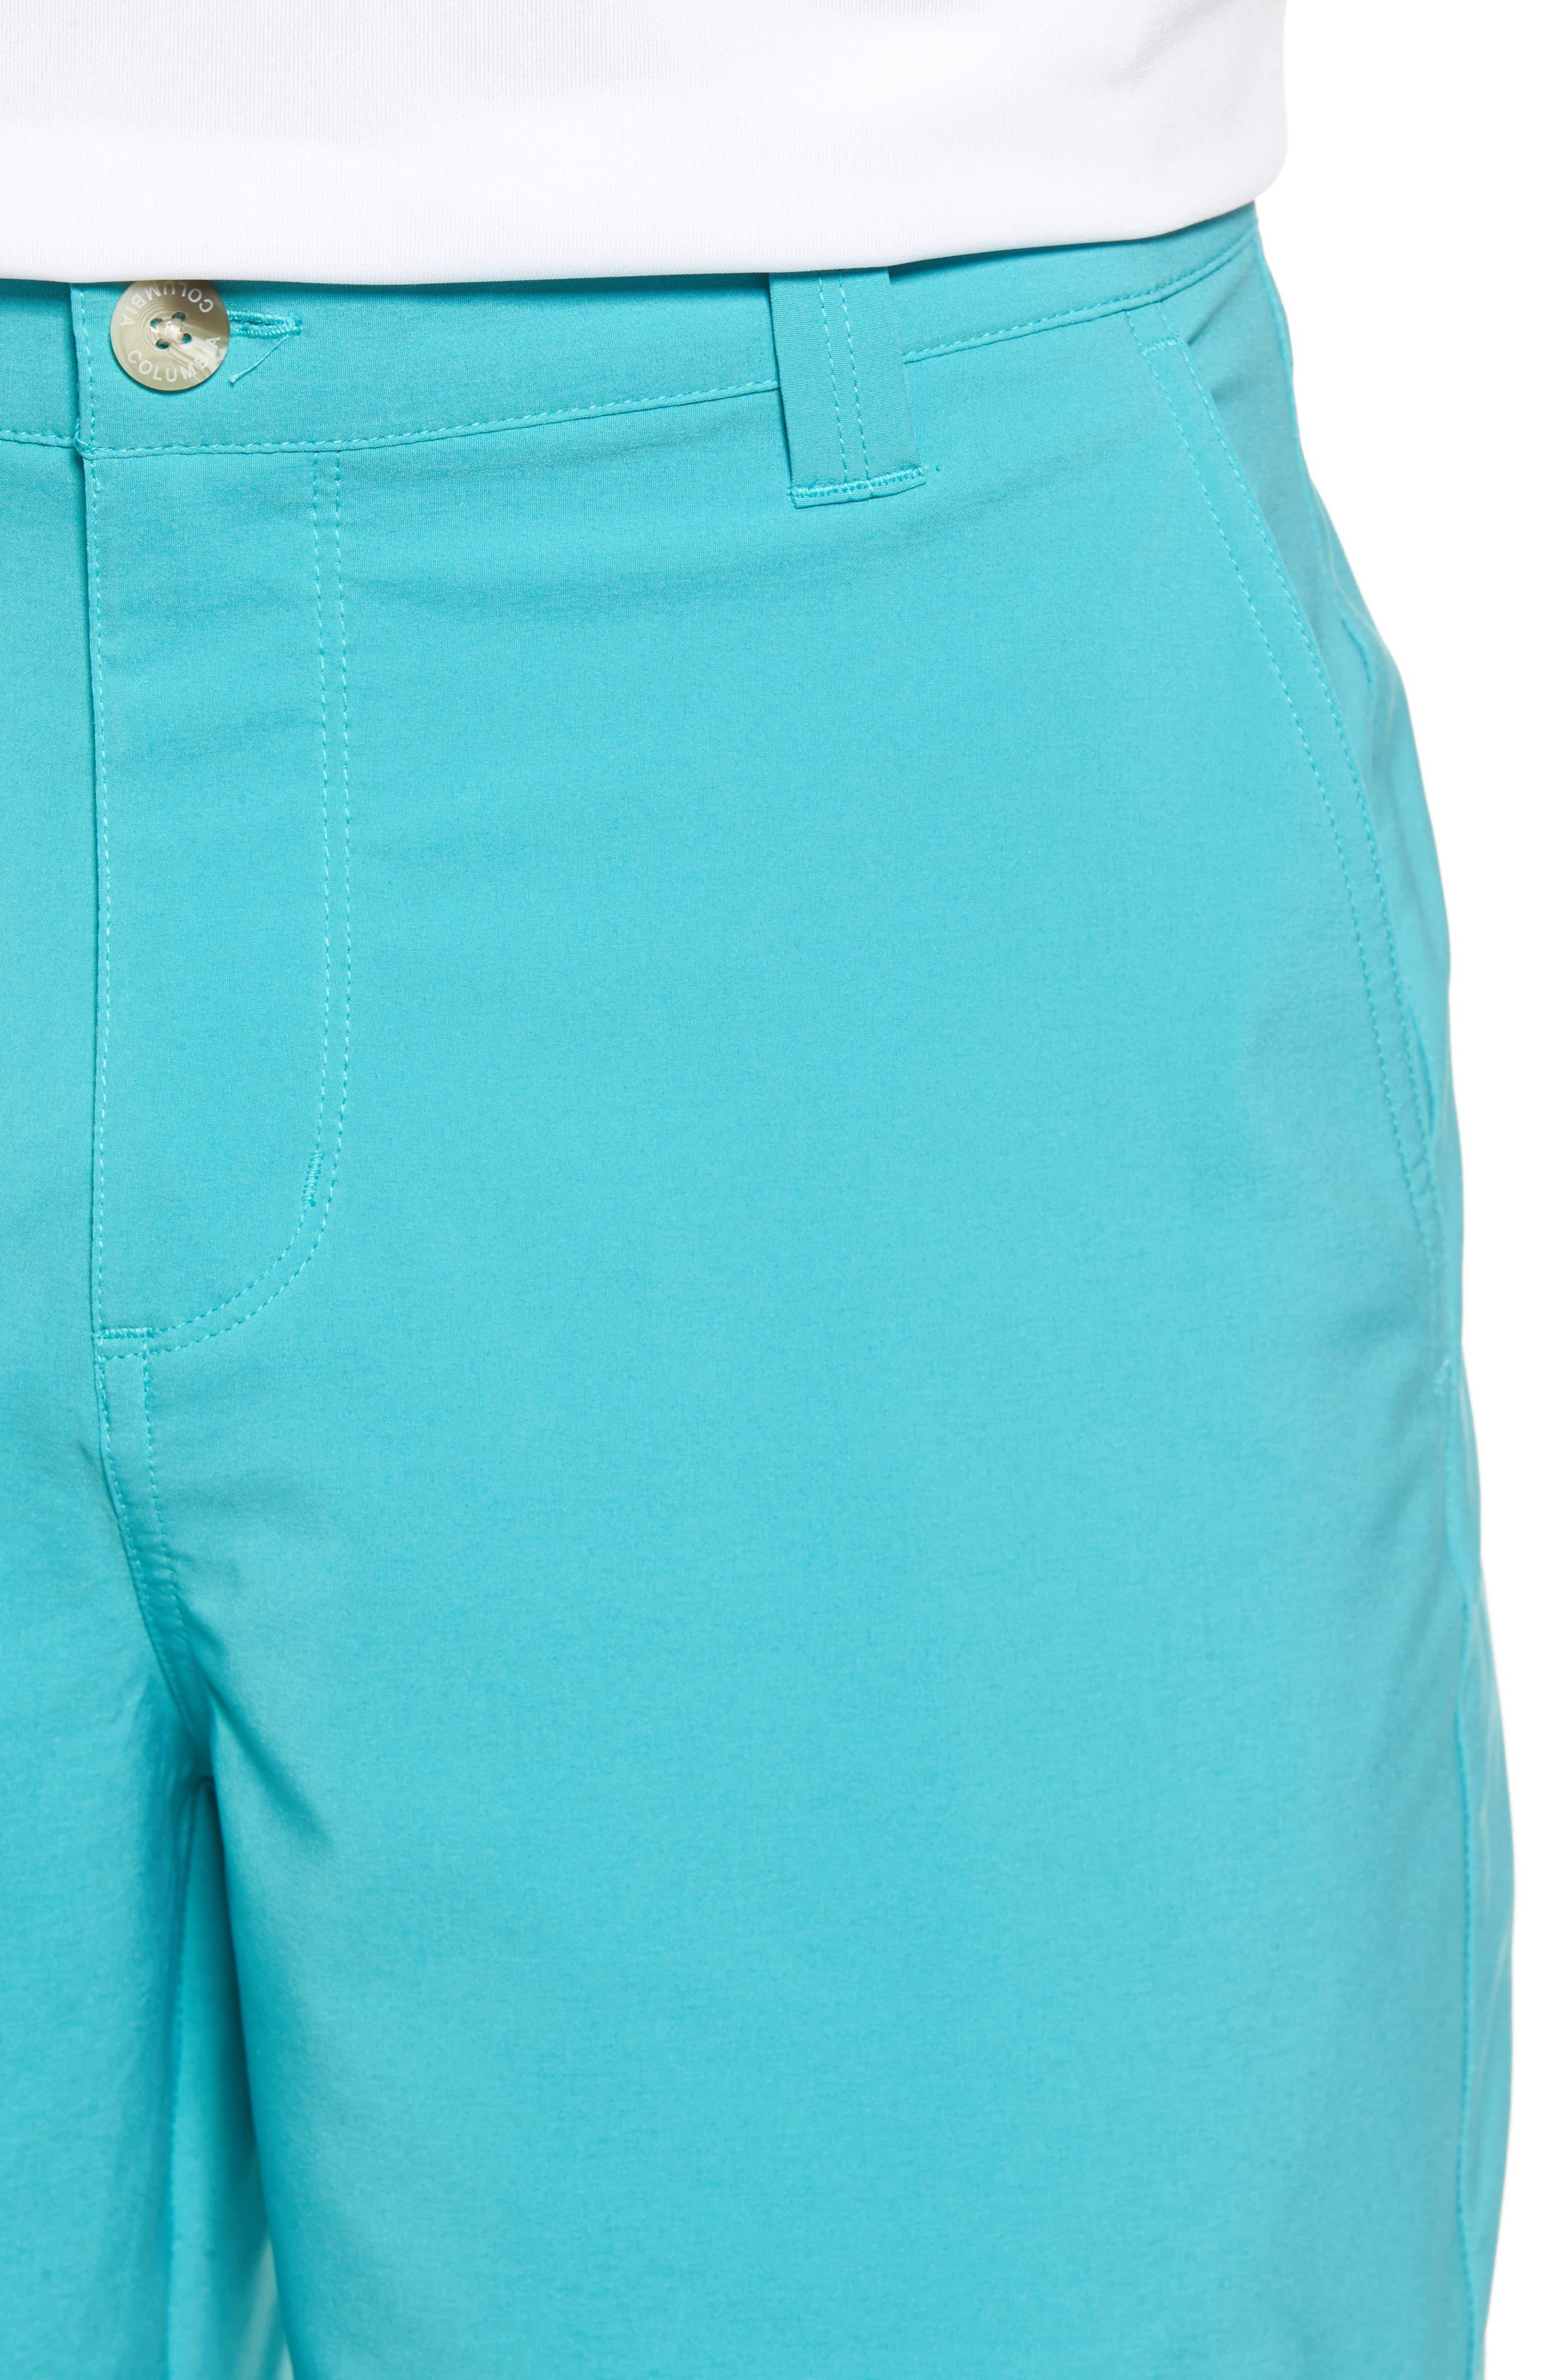 PFG Grander Marlin II Shorts,                             Alternate thumbnail 4, color,                             440